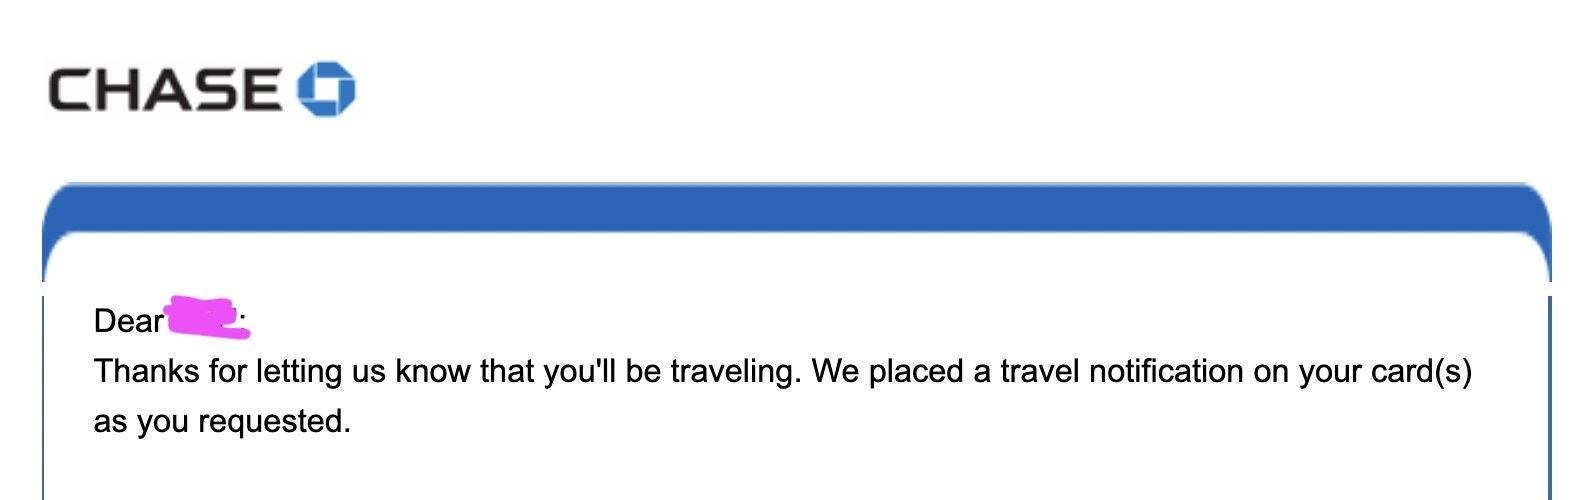 Screenshot of a travel notification